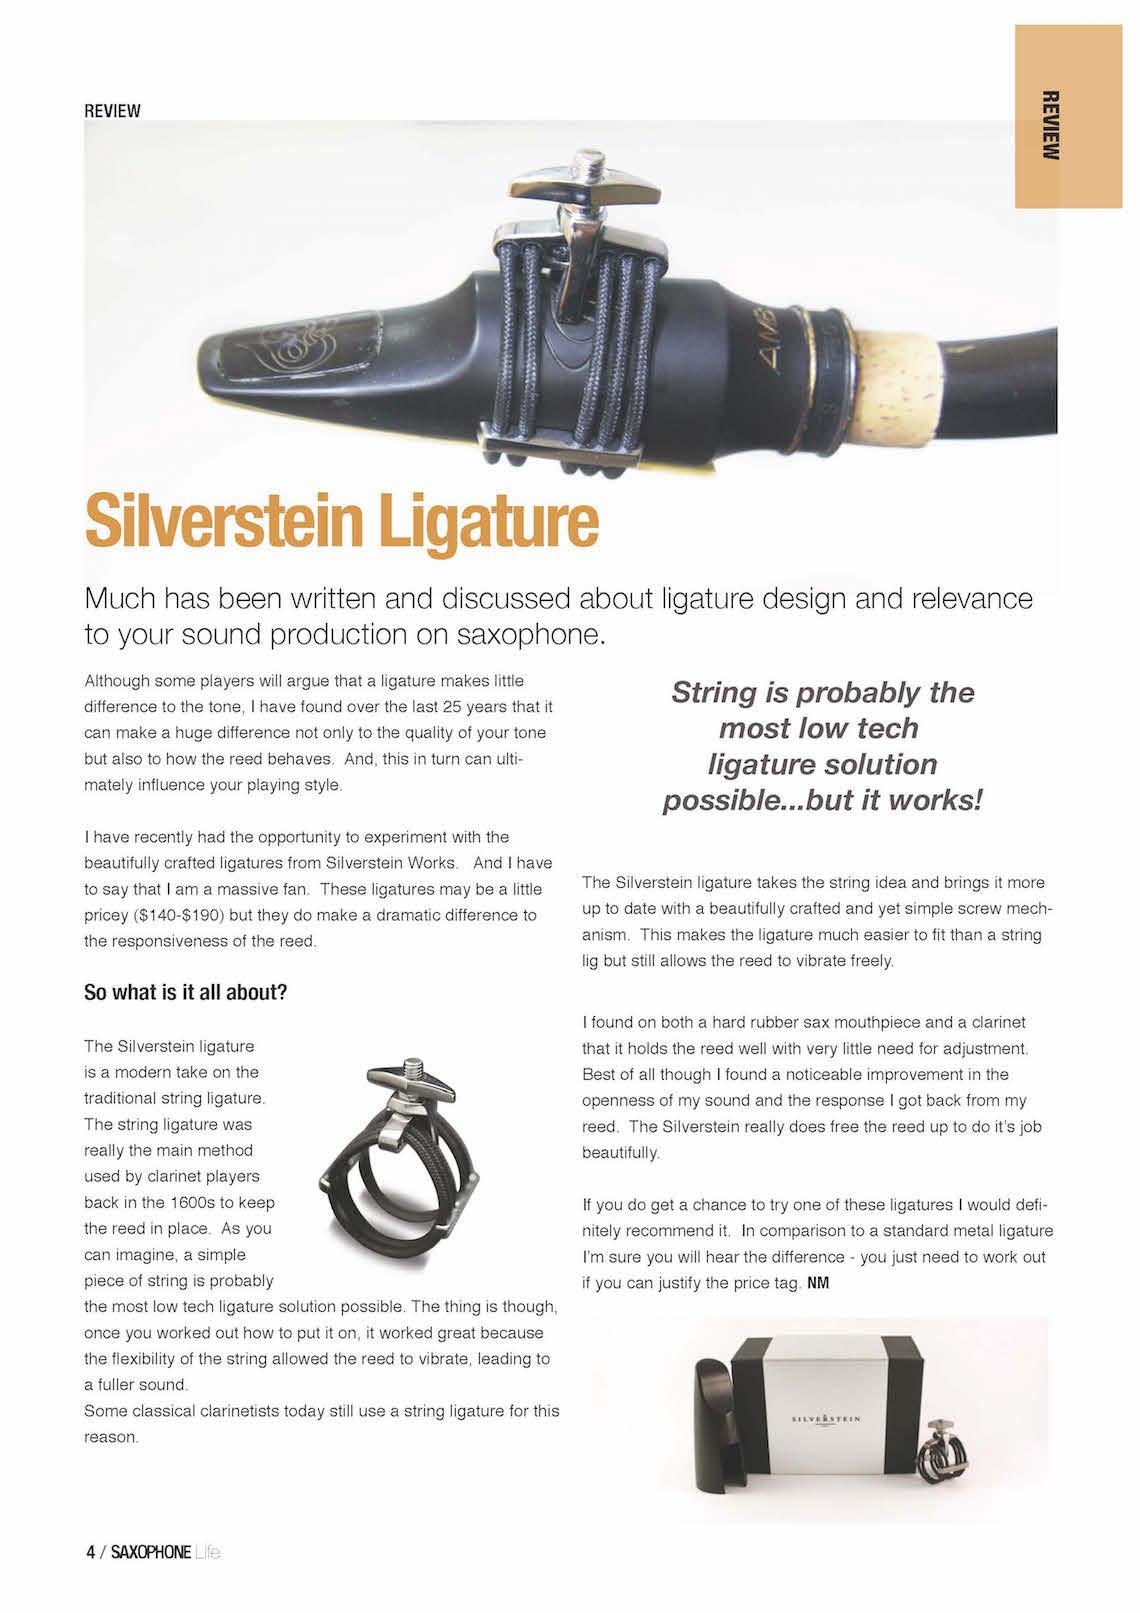 Saxophone Life Feb 2015 - Silverstein Works_Page_2